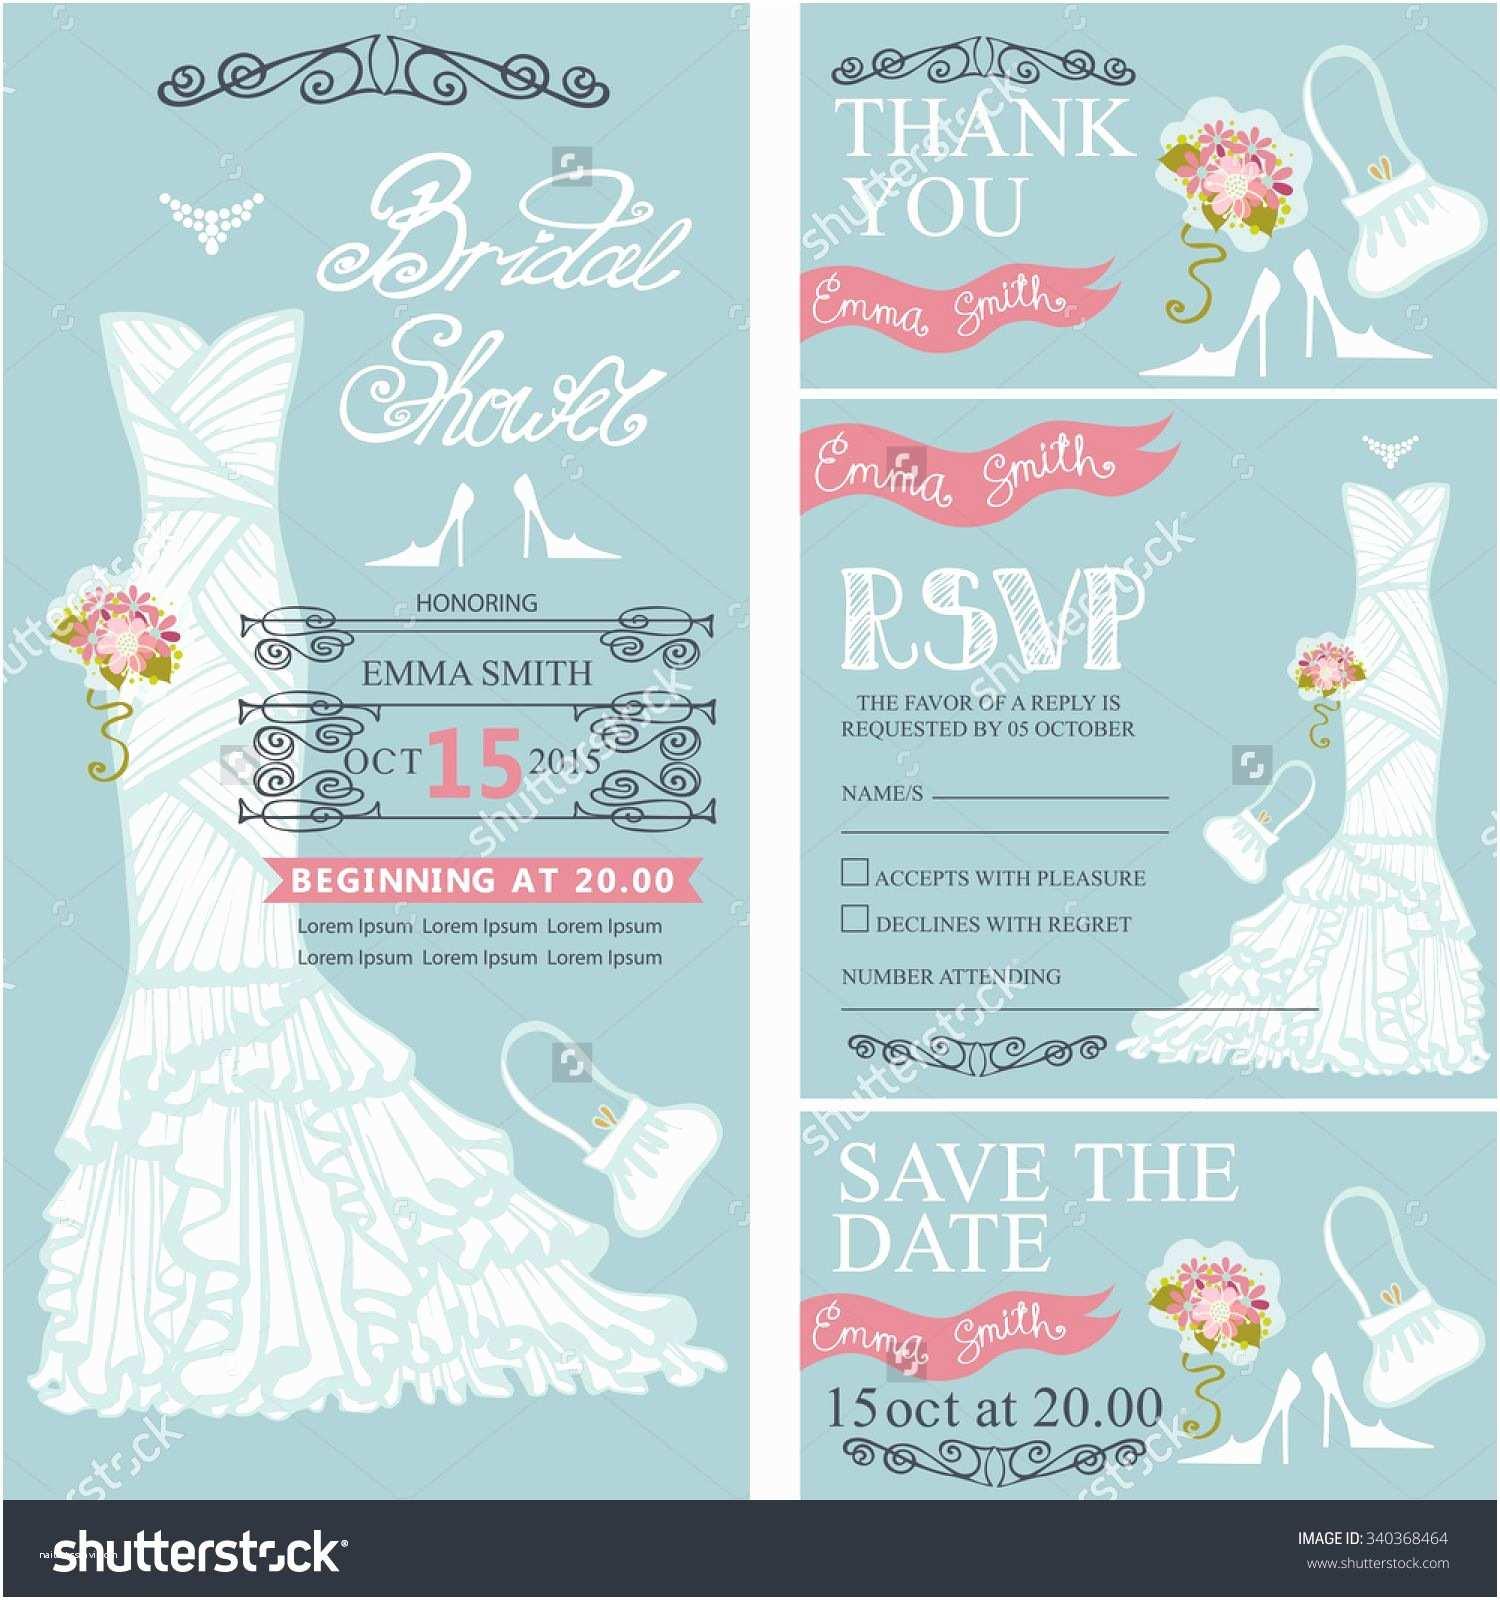 Online Bridal Shower Invitations Wedding Shower Invitation Wedding Shower Invitations